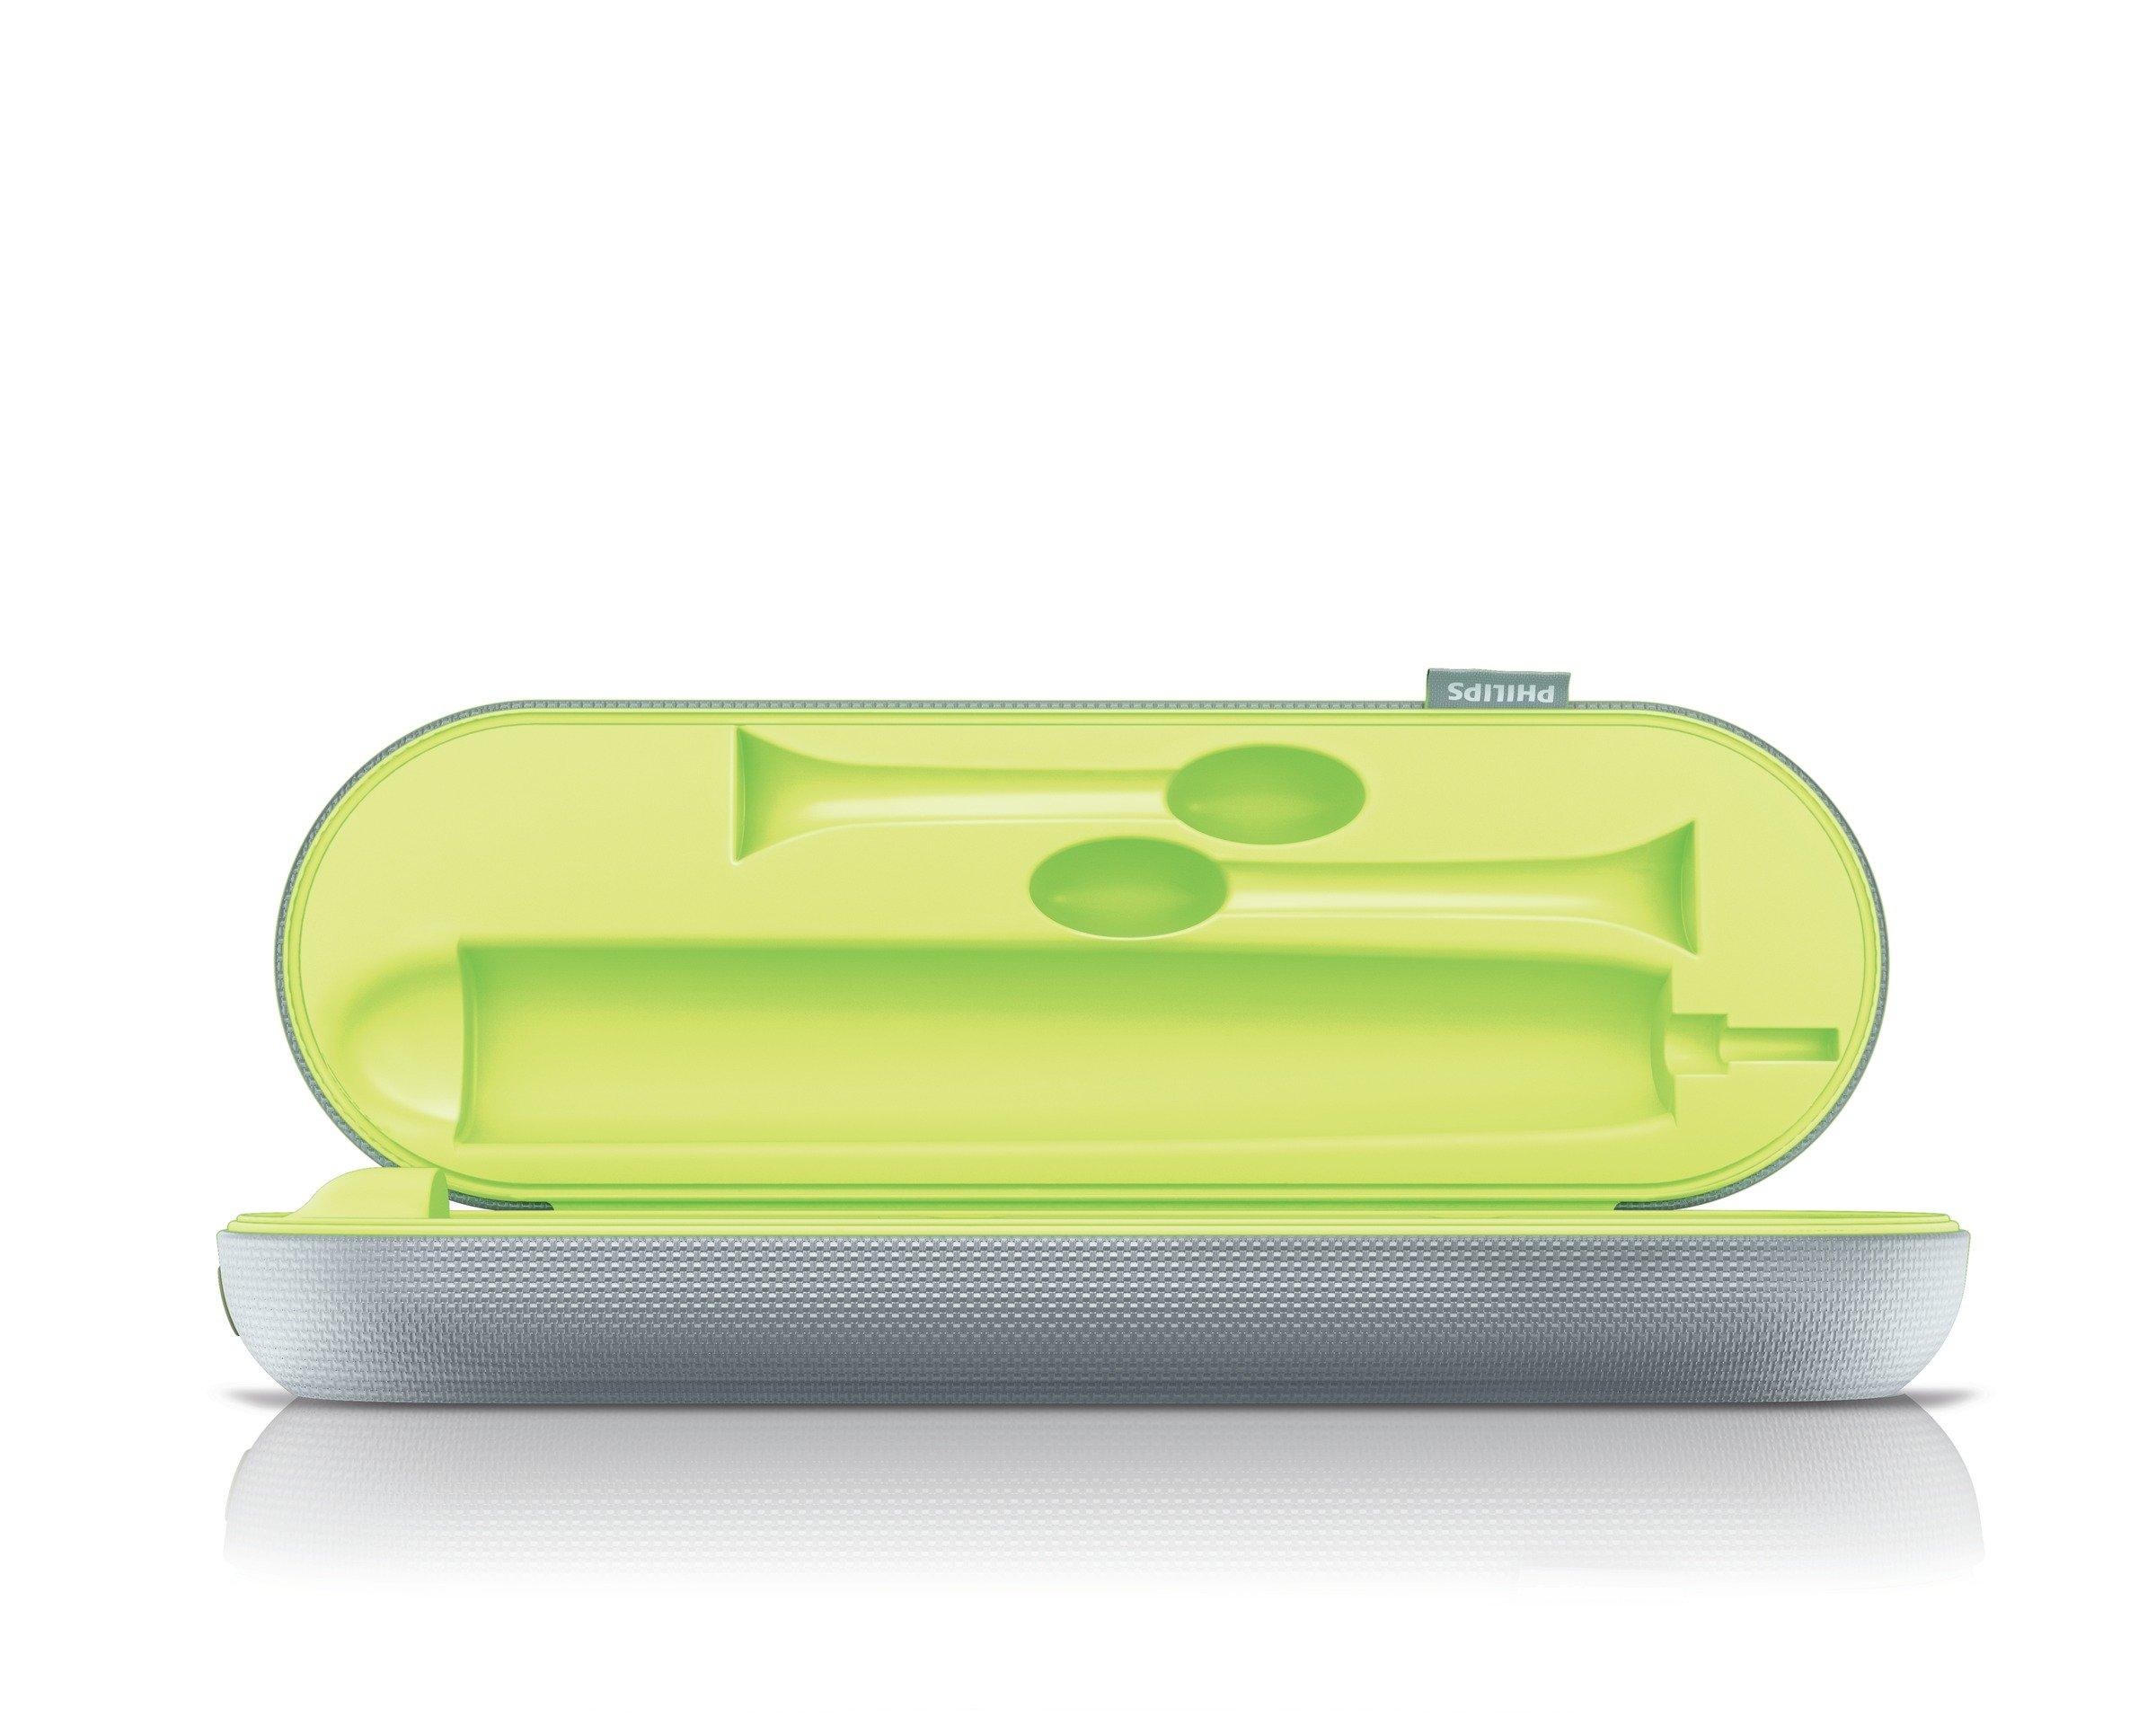 Philips Sonicare Diamondclean Charging Travel Case, HX9000/03